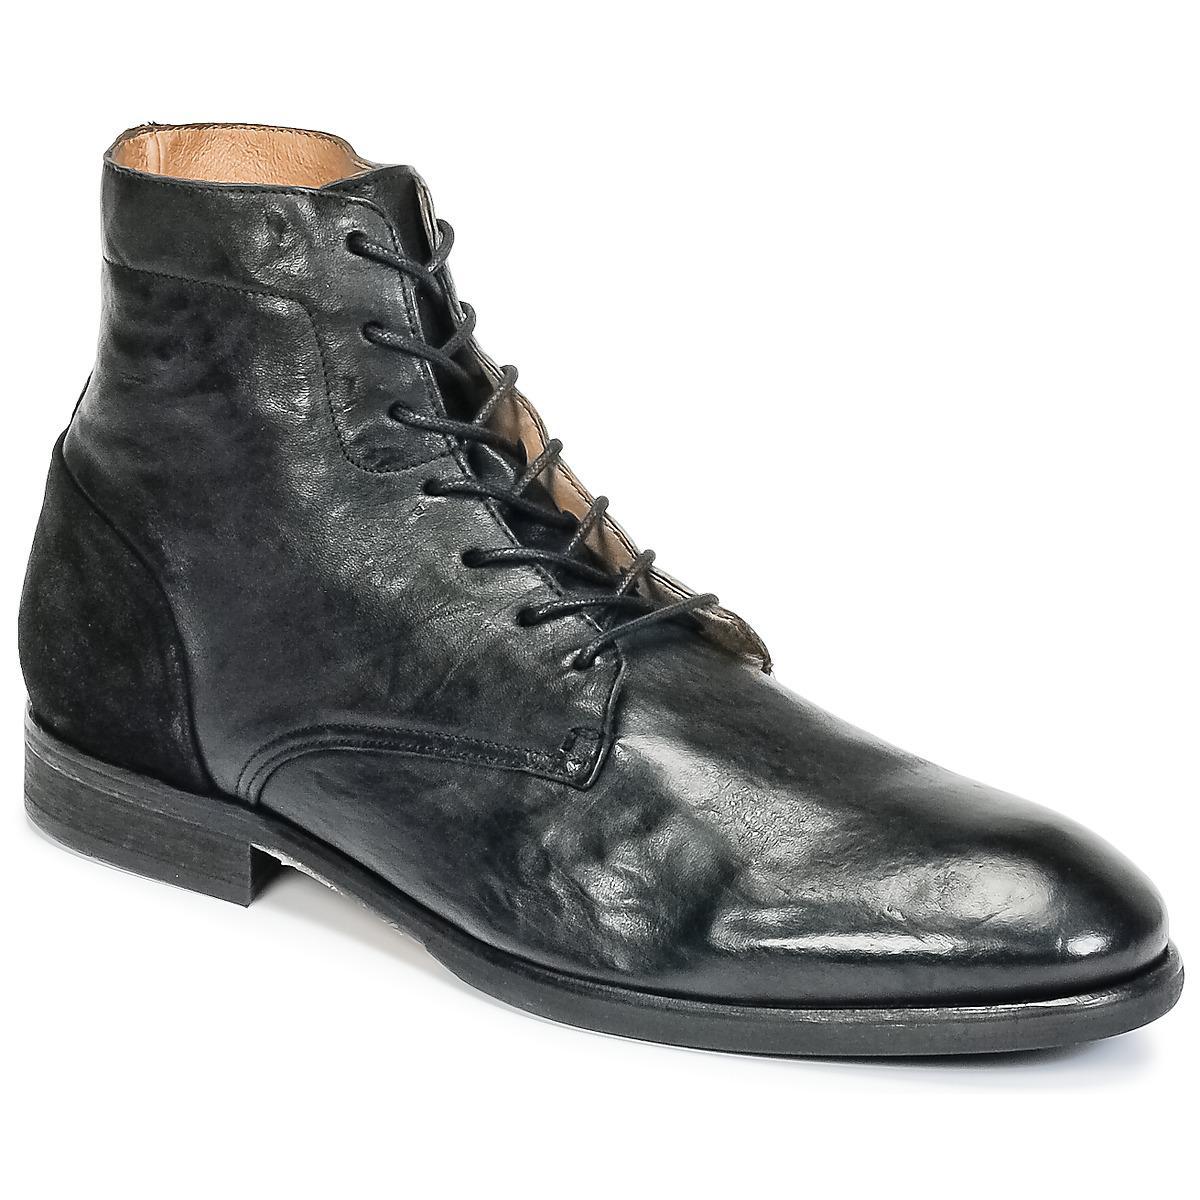 2b77dacb5eeaea Men s Boots Black Yoackley Mid Lyst For Hudson Jeans Men In reExQoWBCd